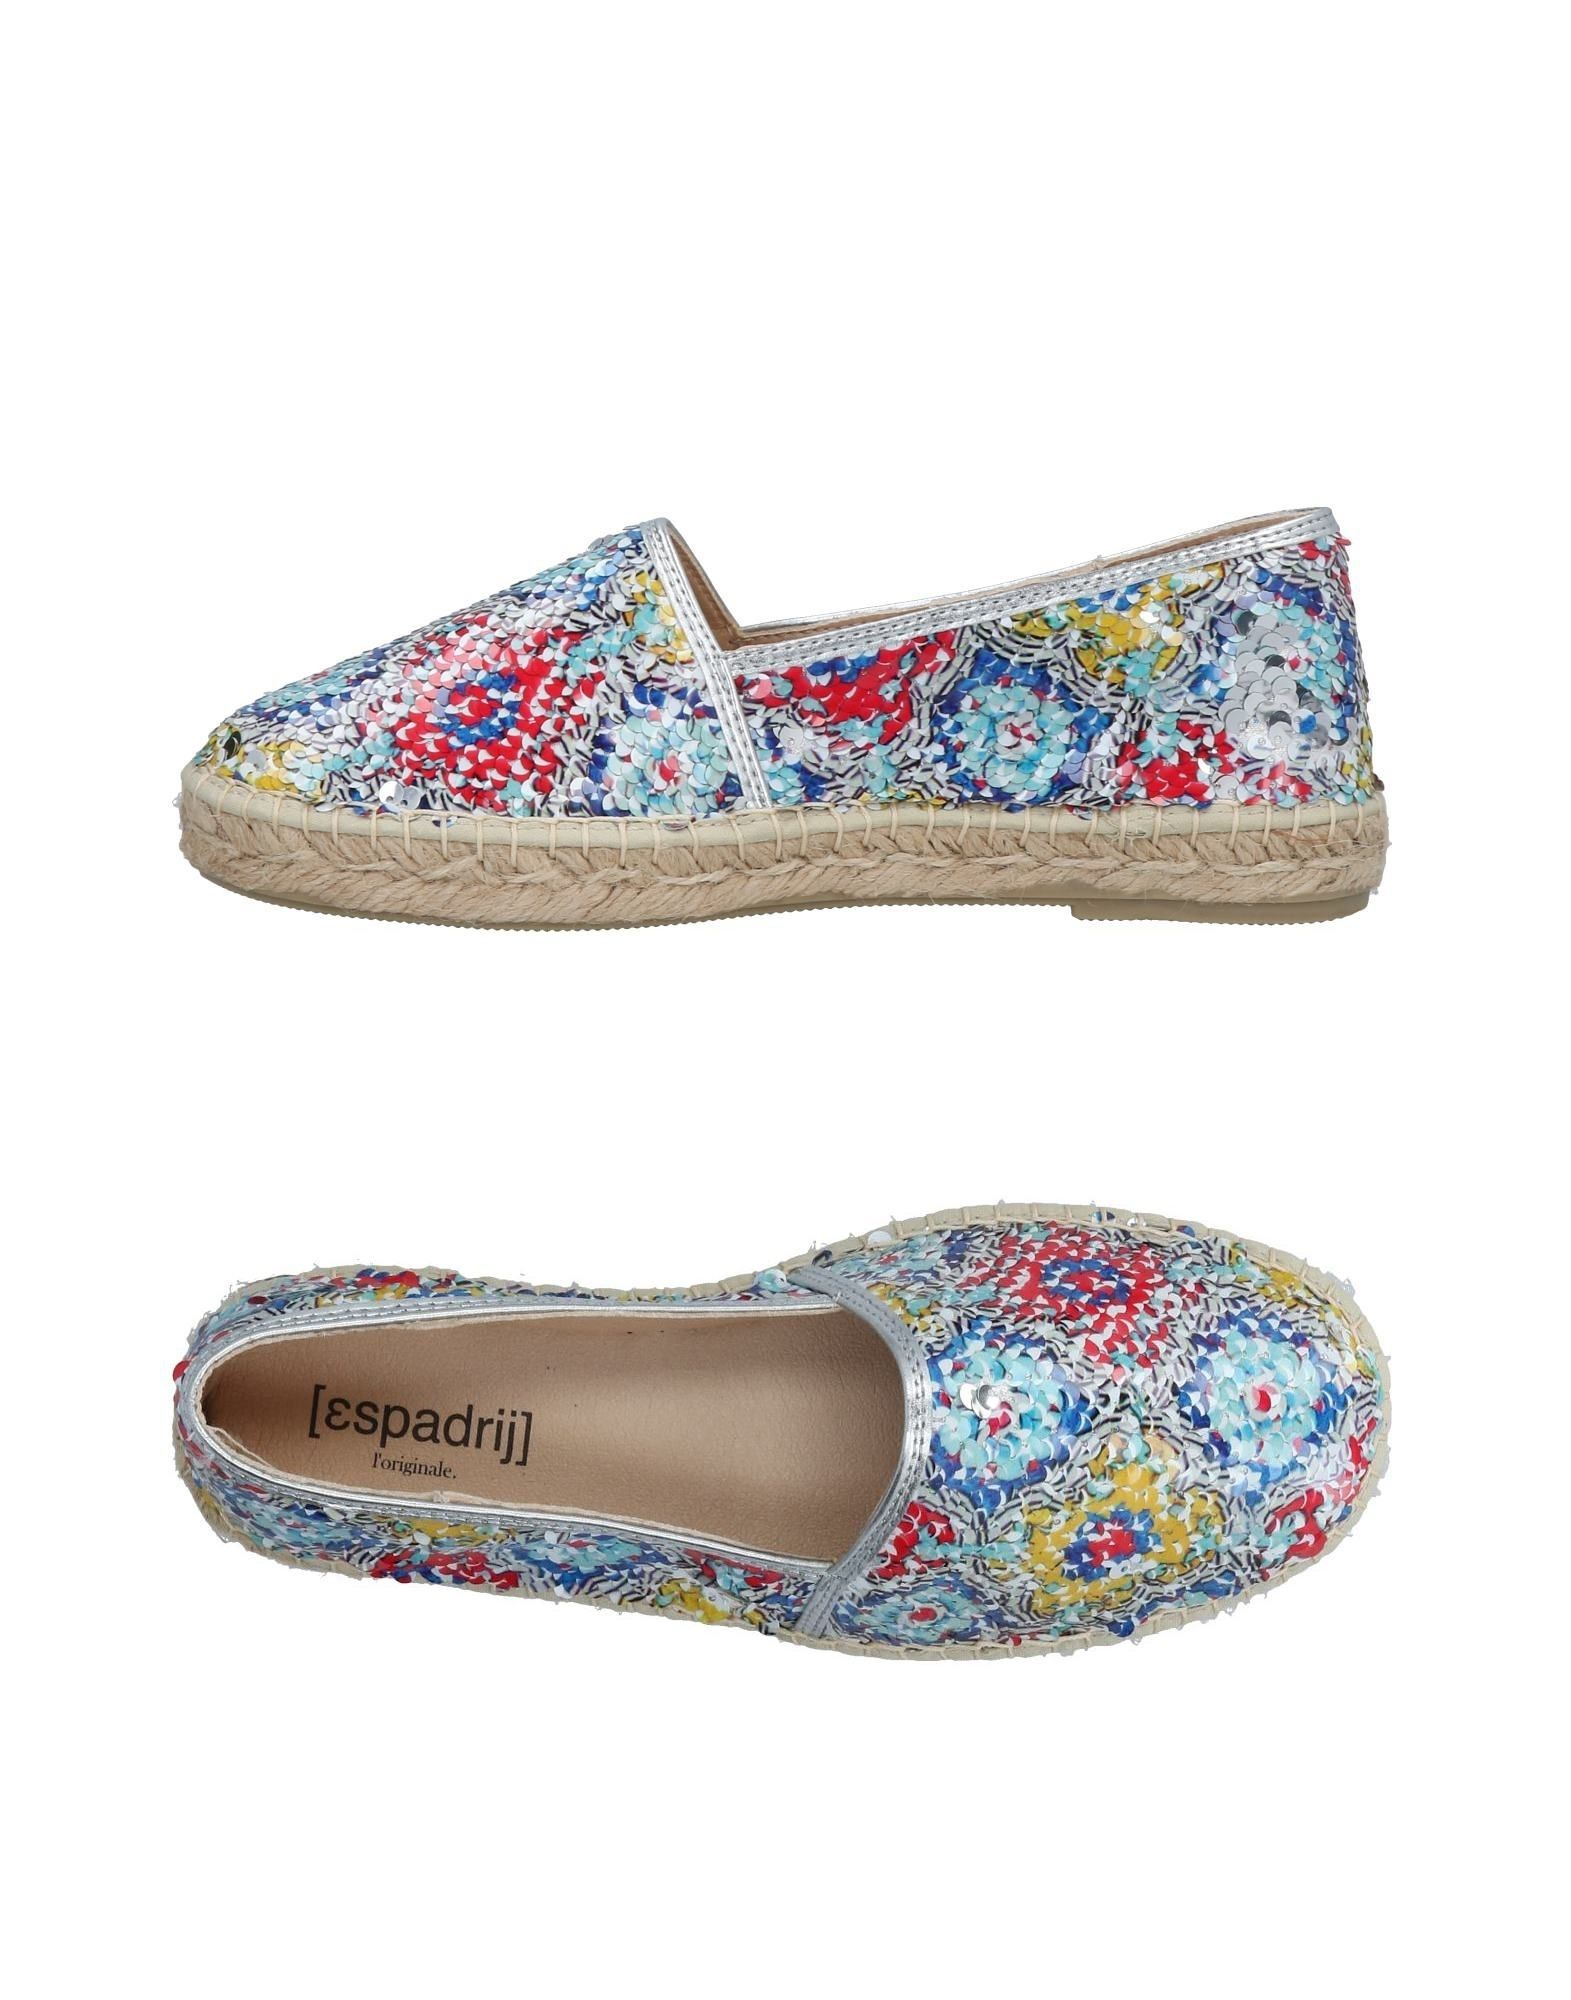 Haltbare Mode billige Schuhe [Espadrij] Espadrilles Damen  11483932BF Heiße Schuhe